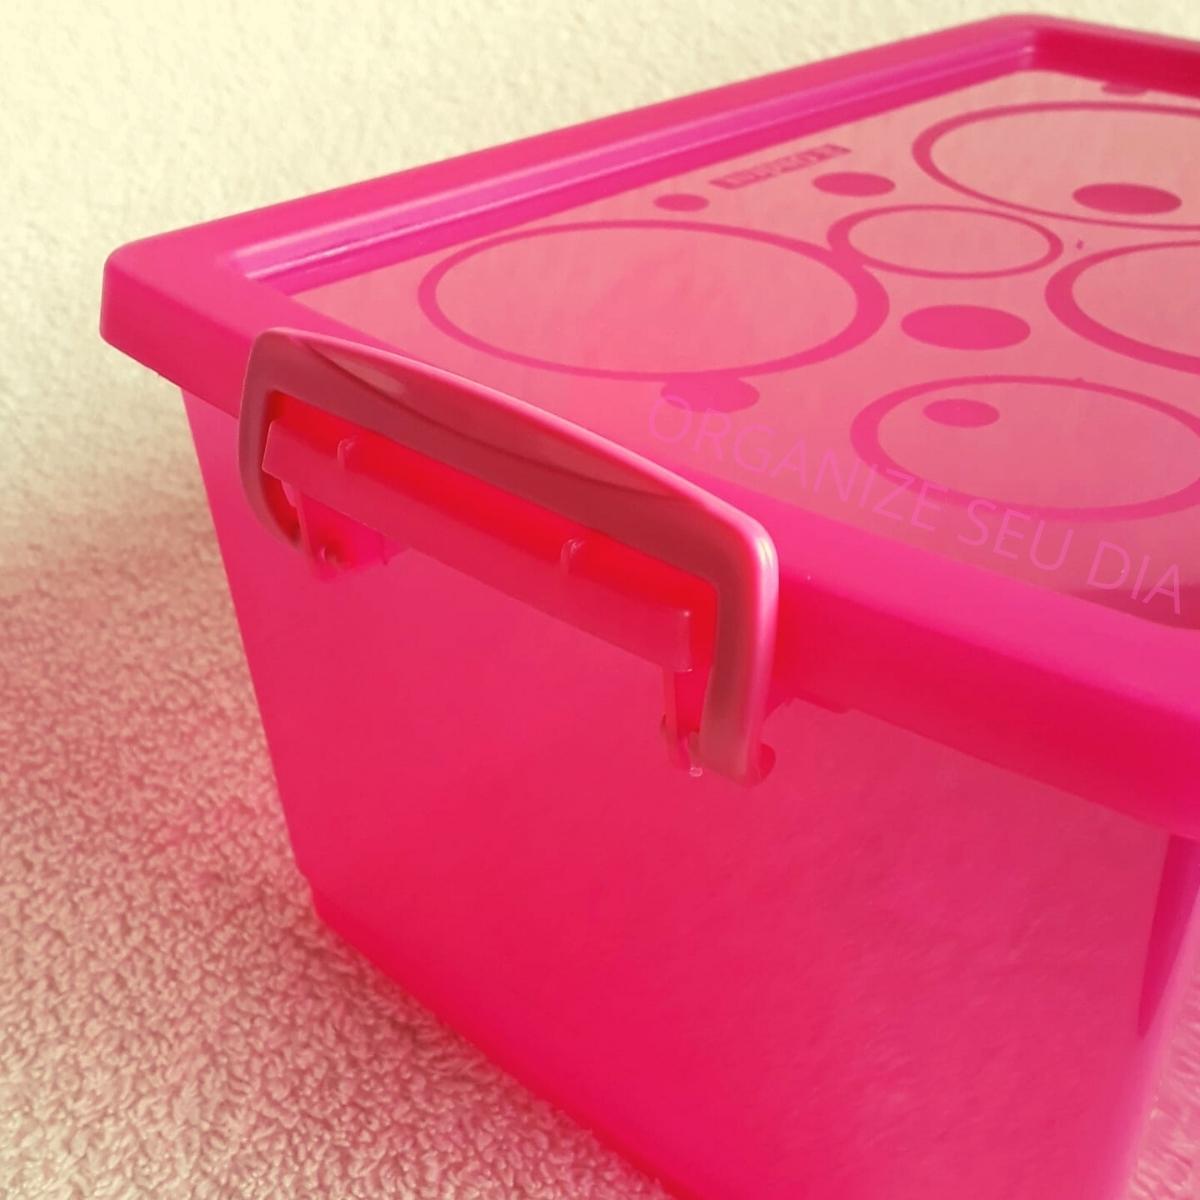 Caixa Organizadora Plástica com Tampa Pink 650 ml com 6 un